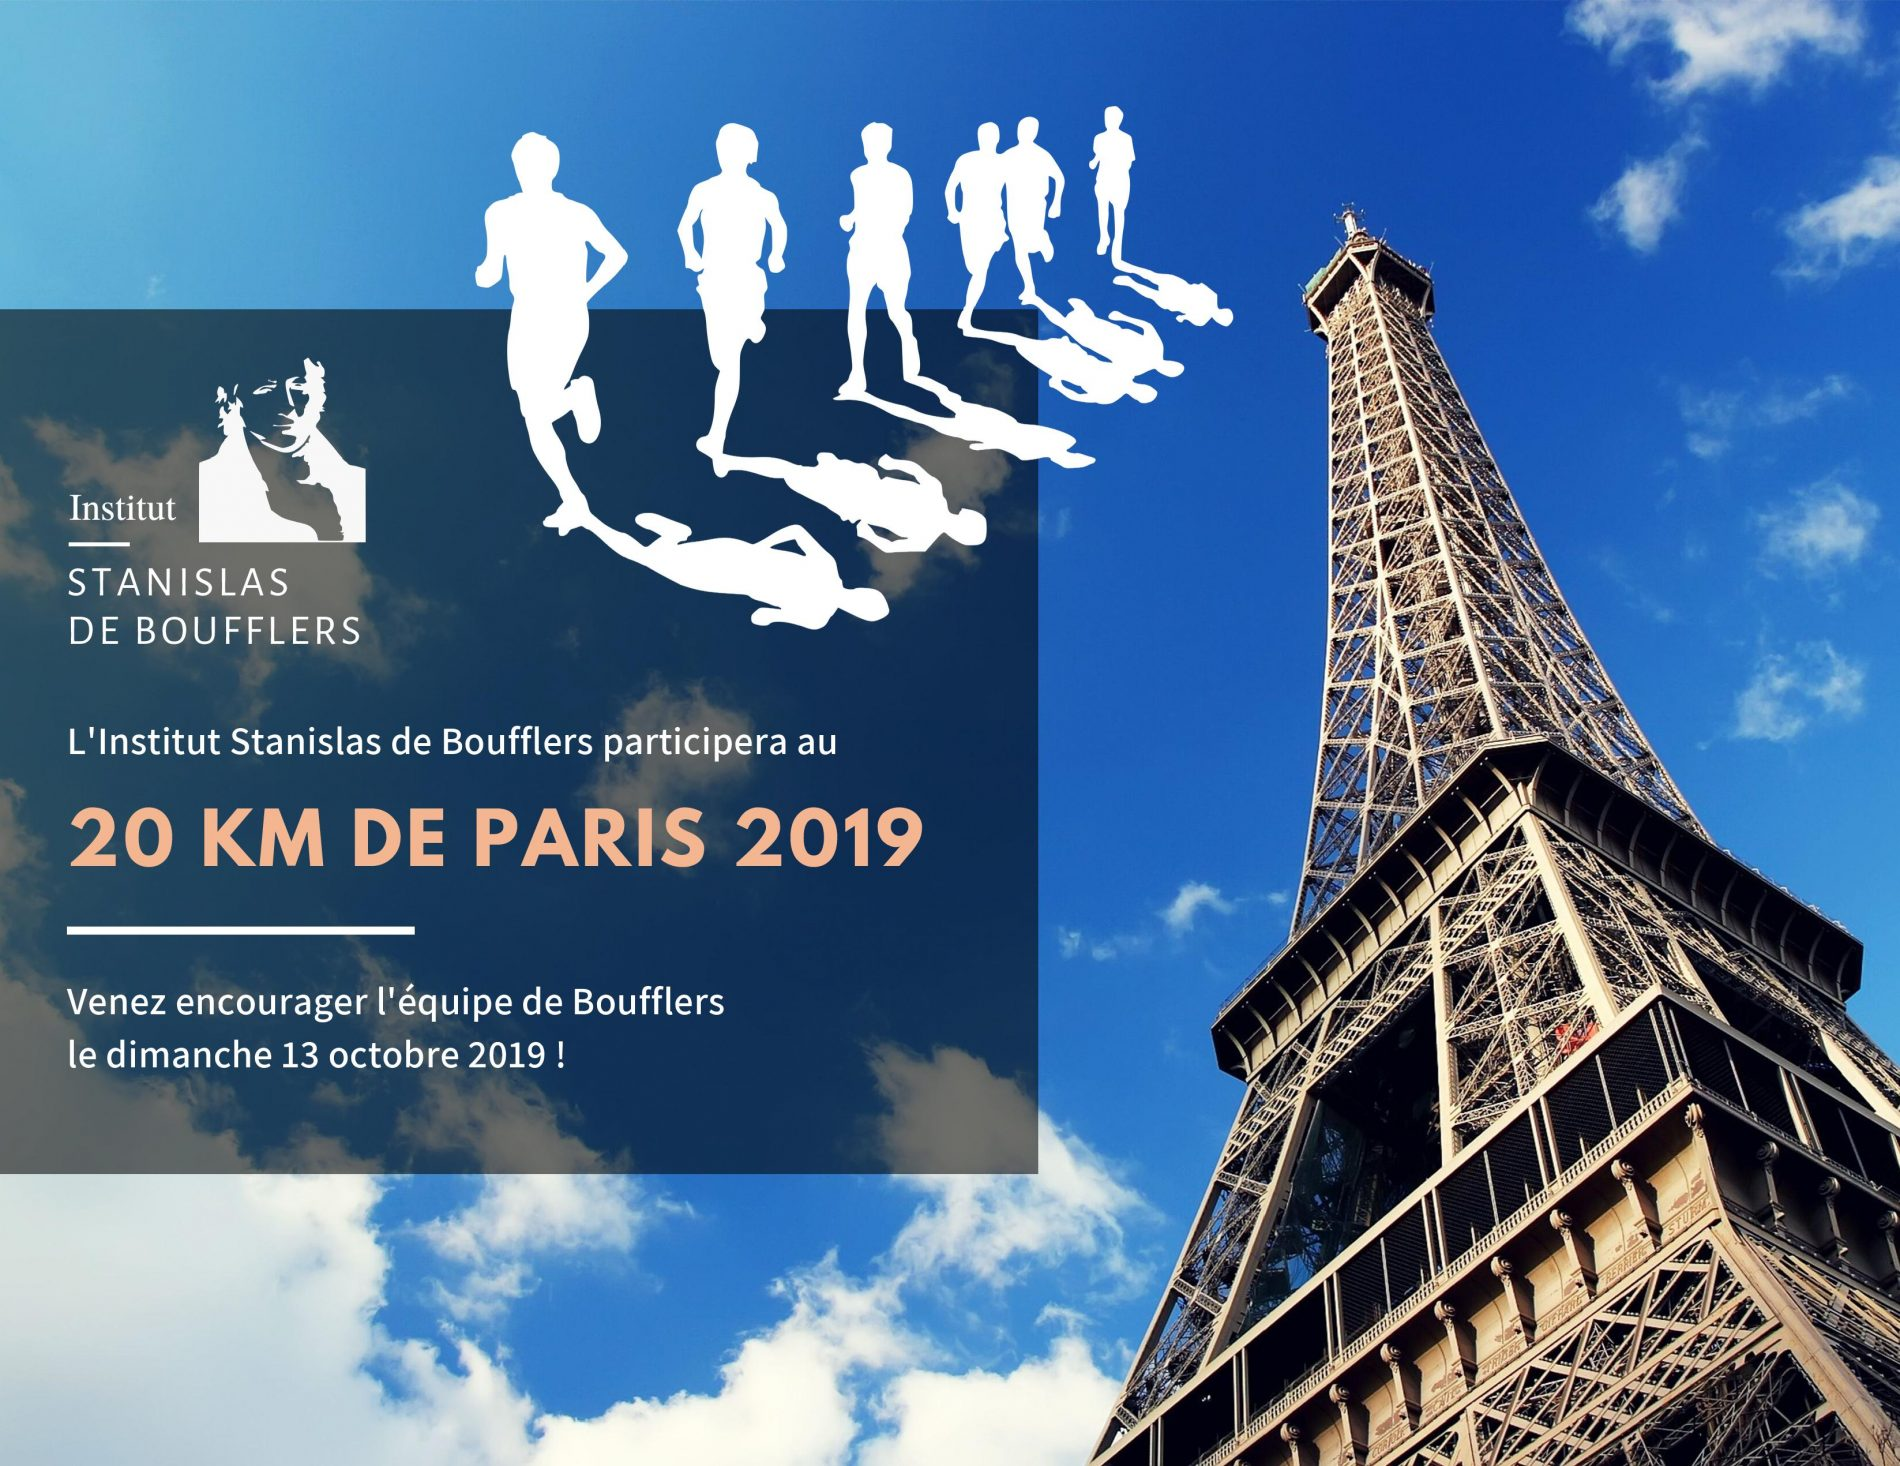 http://www.institutboufflers.org/wp-content/uploads/2019/10/ISB_20km_Paris-page-001.jpg